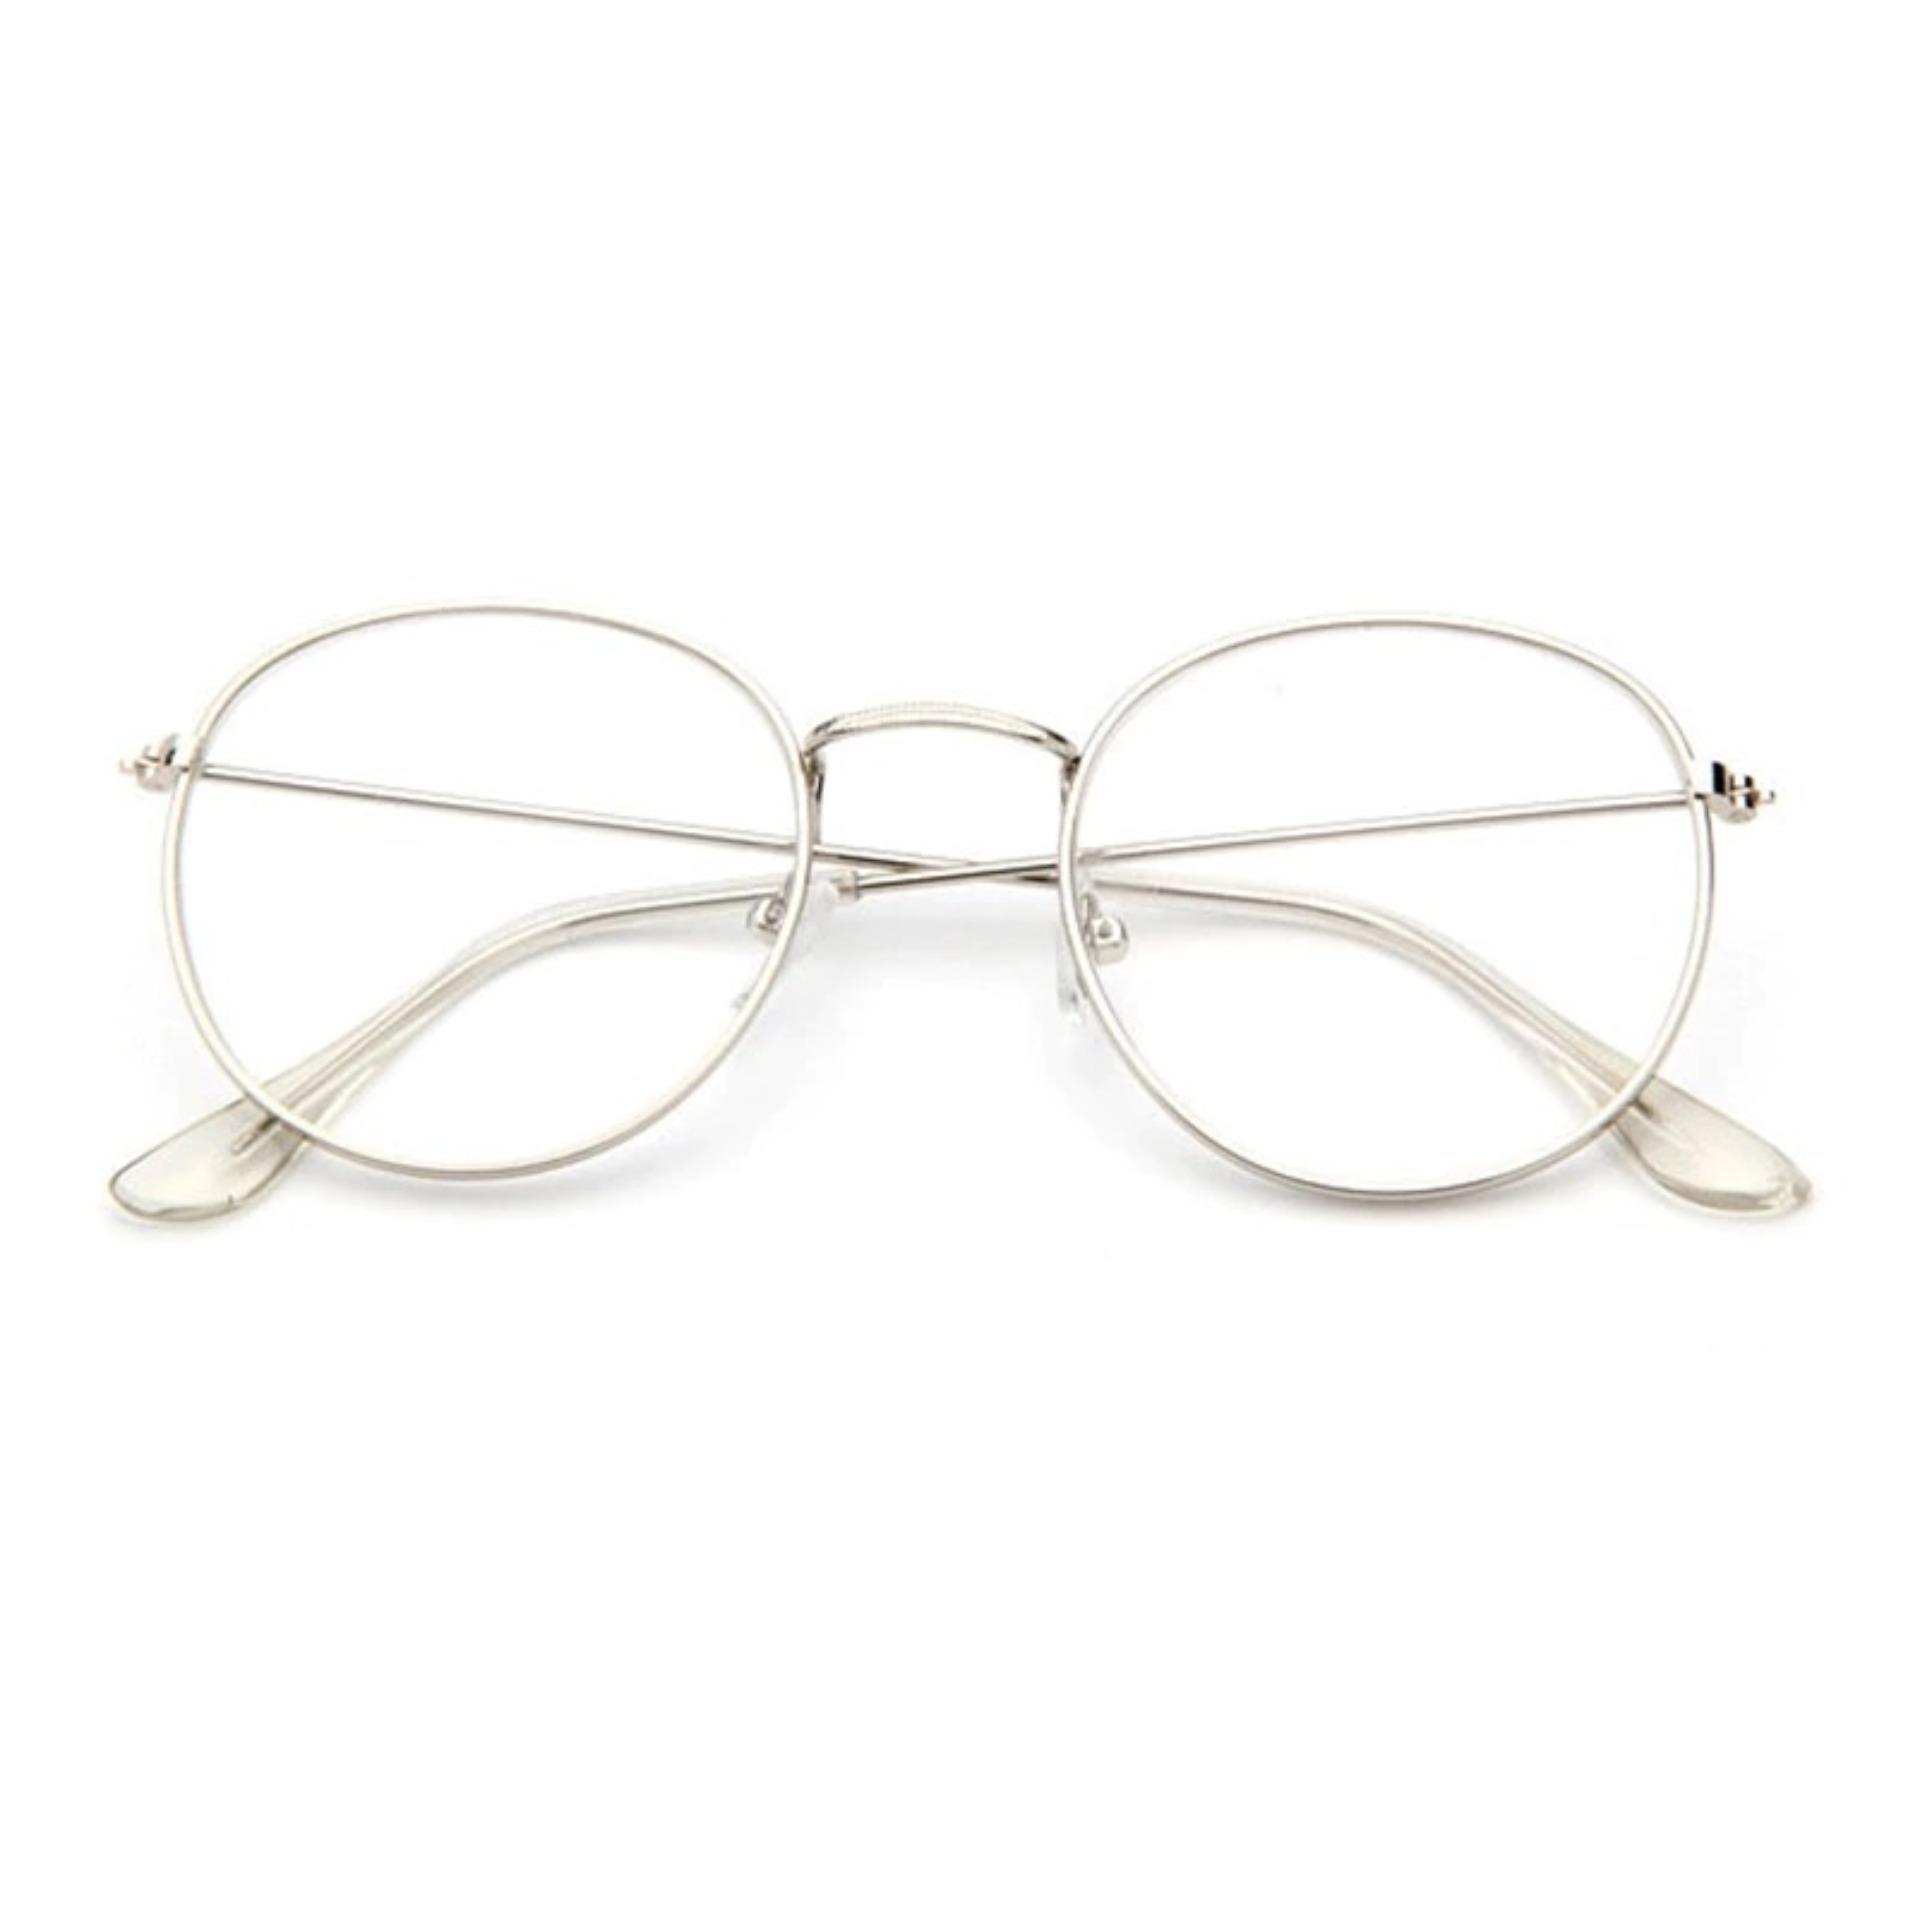 Vintage Fashion Sunglasses MN1000 - Kacamata wanita - Sabyan - nissa -  Populer a1258f2210